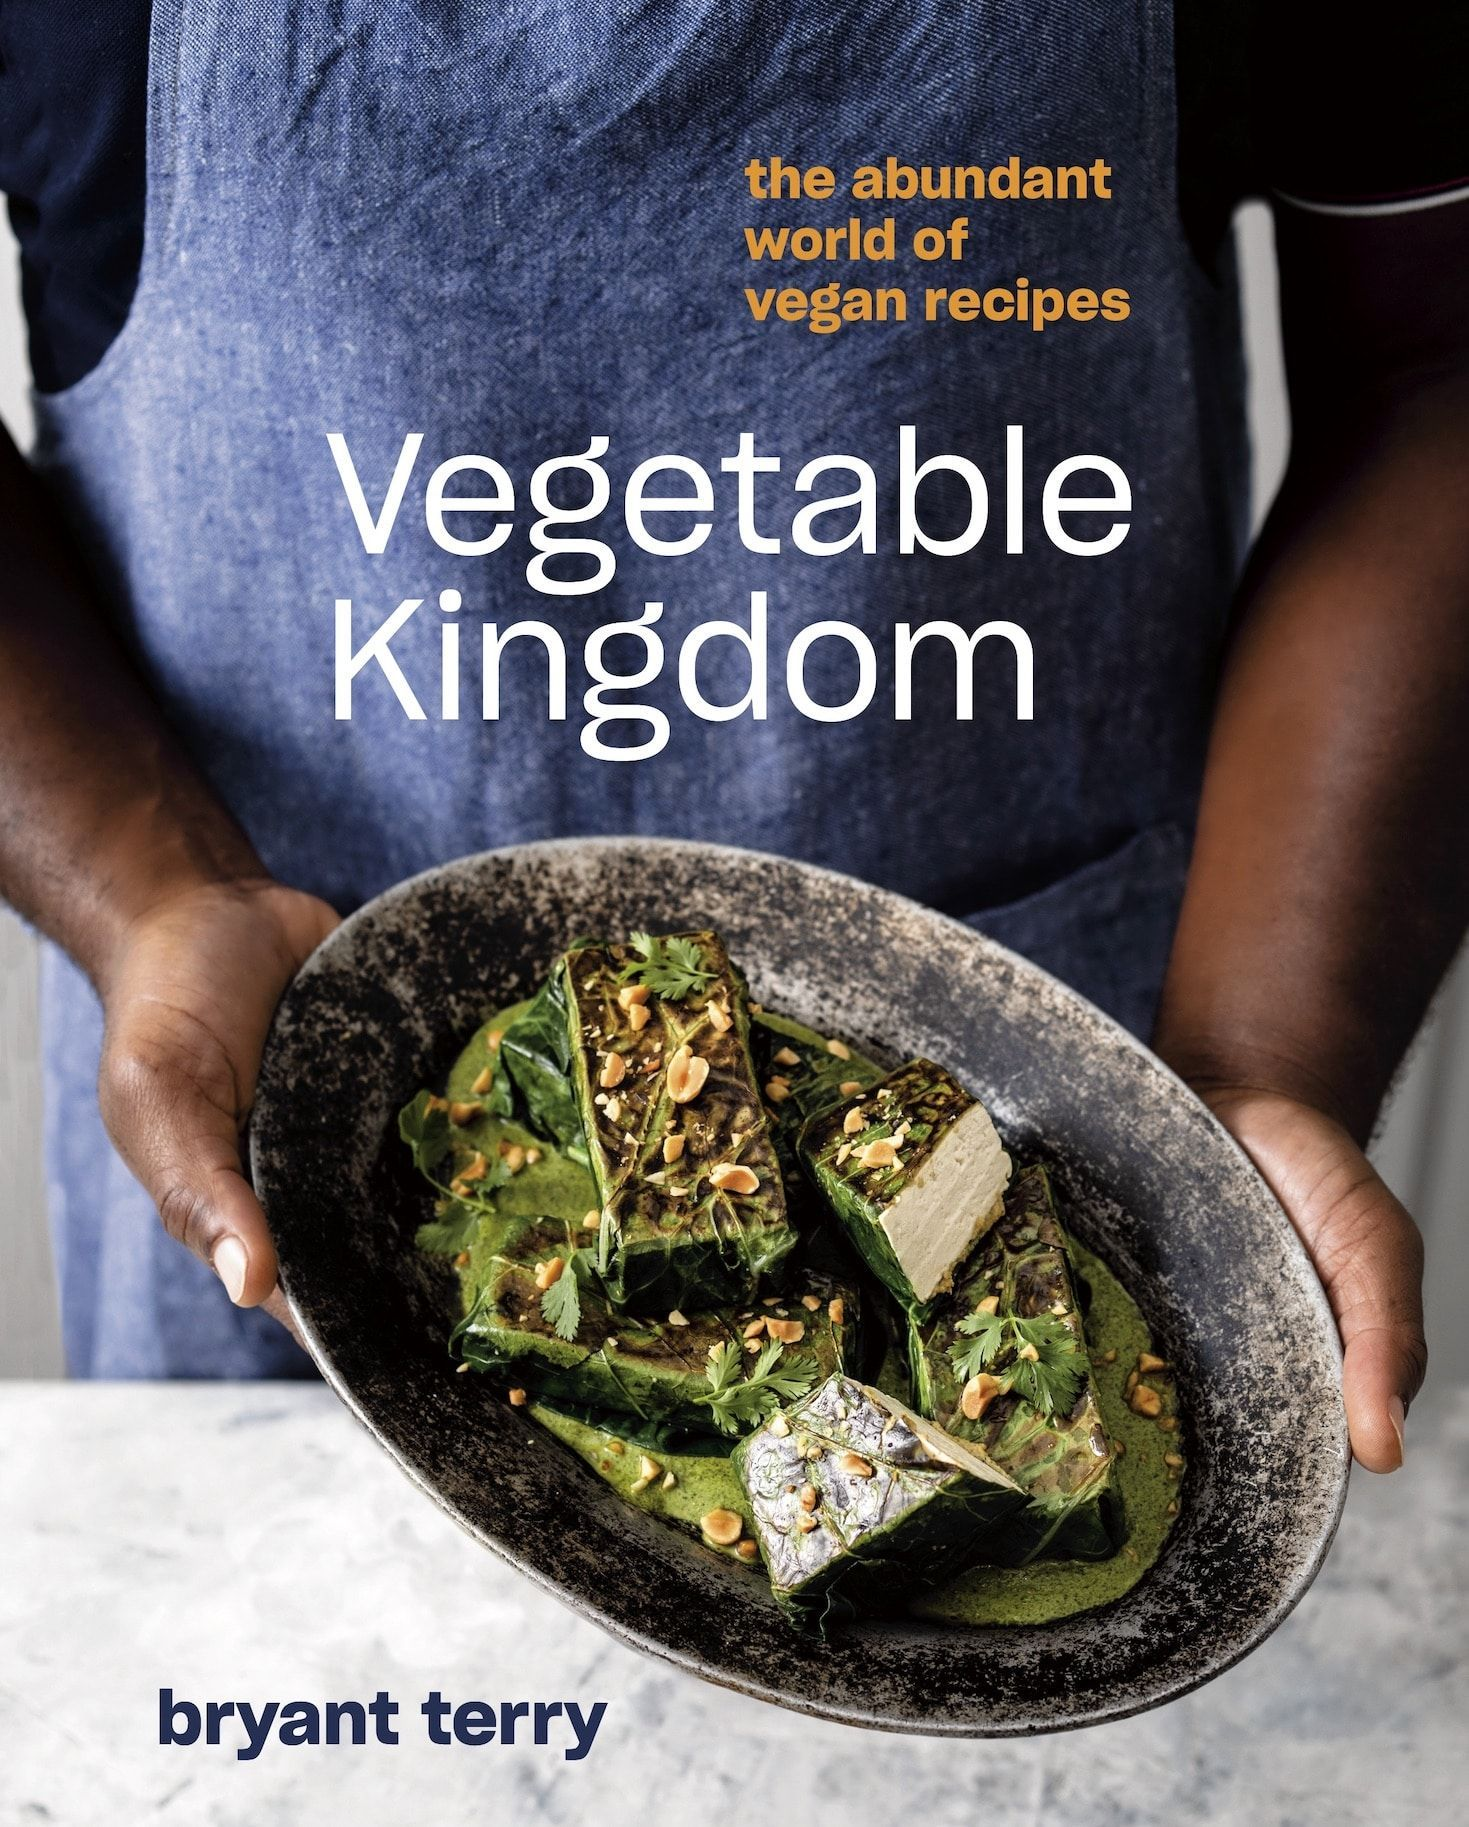 10 Brand New Vegan Cookbooks Every Plant Based Kitchen Needs In 2020 Vegan Recipes Vegan Cookbook Vegan Vegetable Recipes